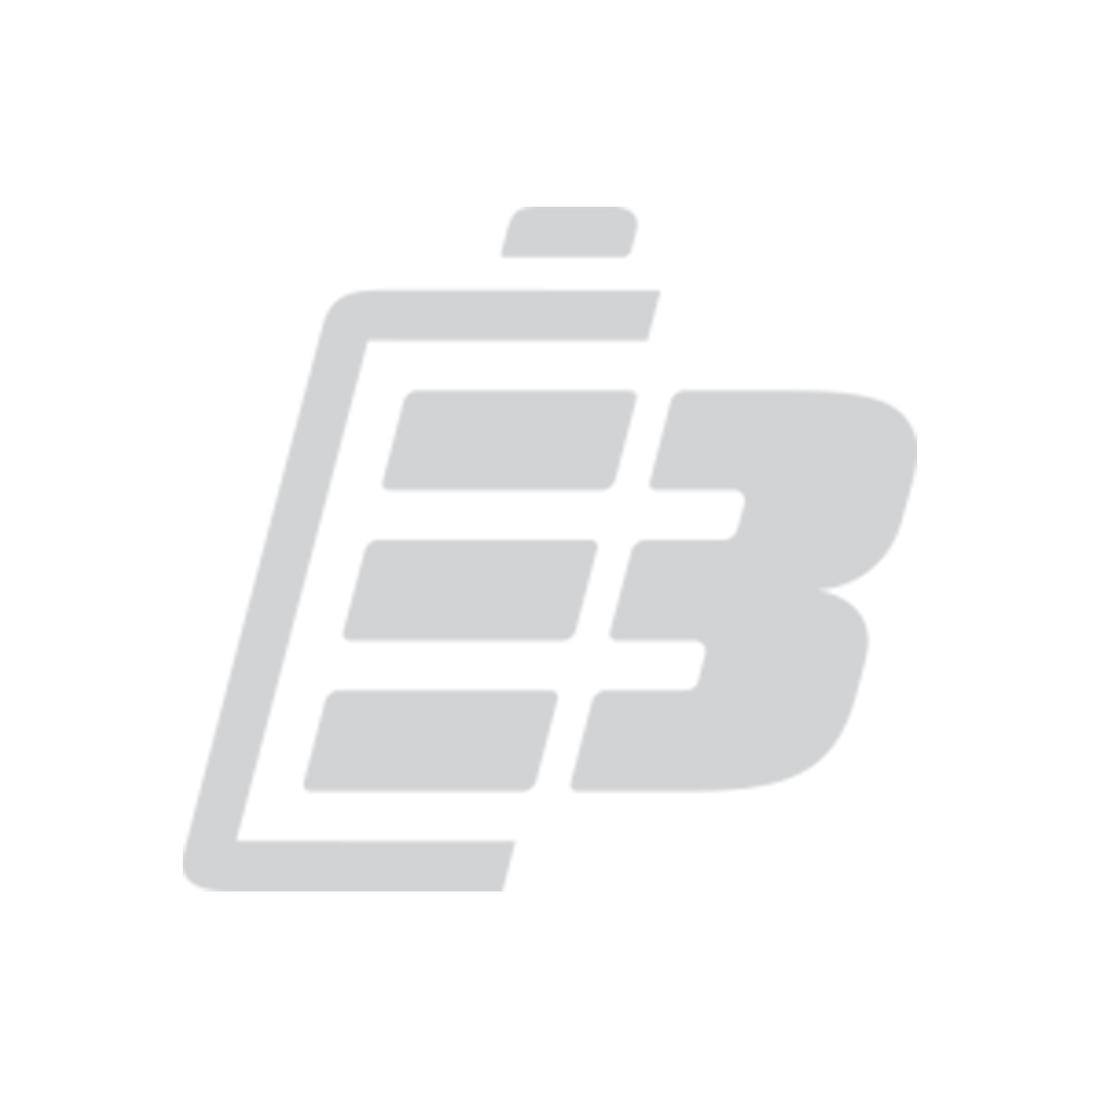 Laptop battery MSI CX640 14.8V_1